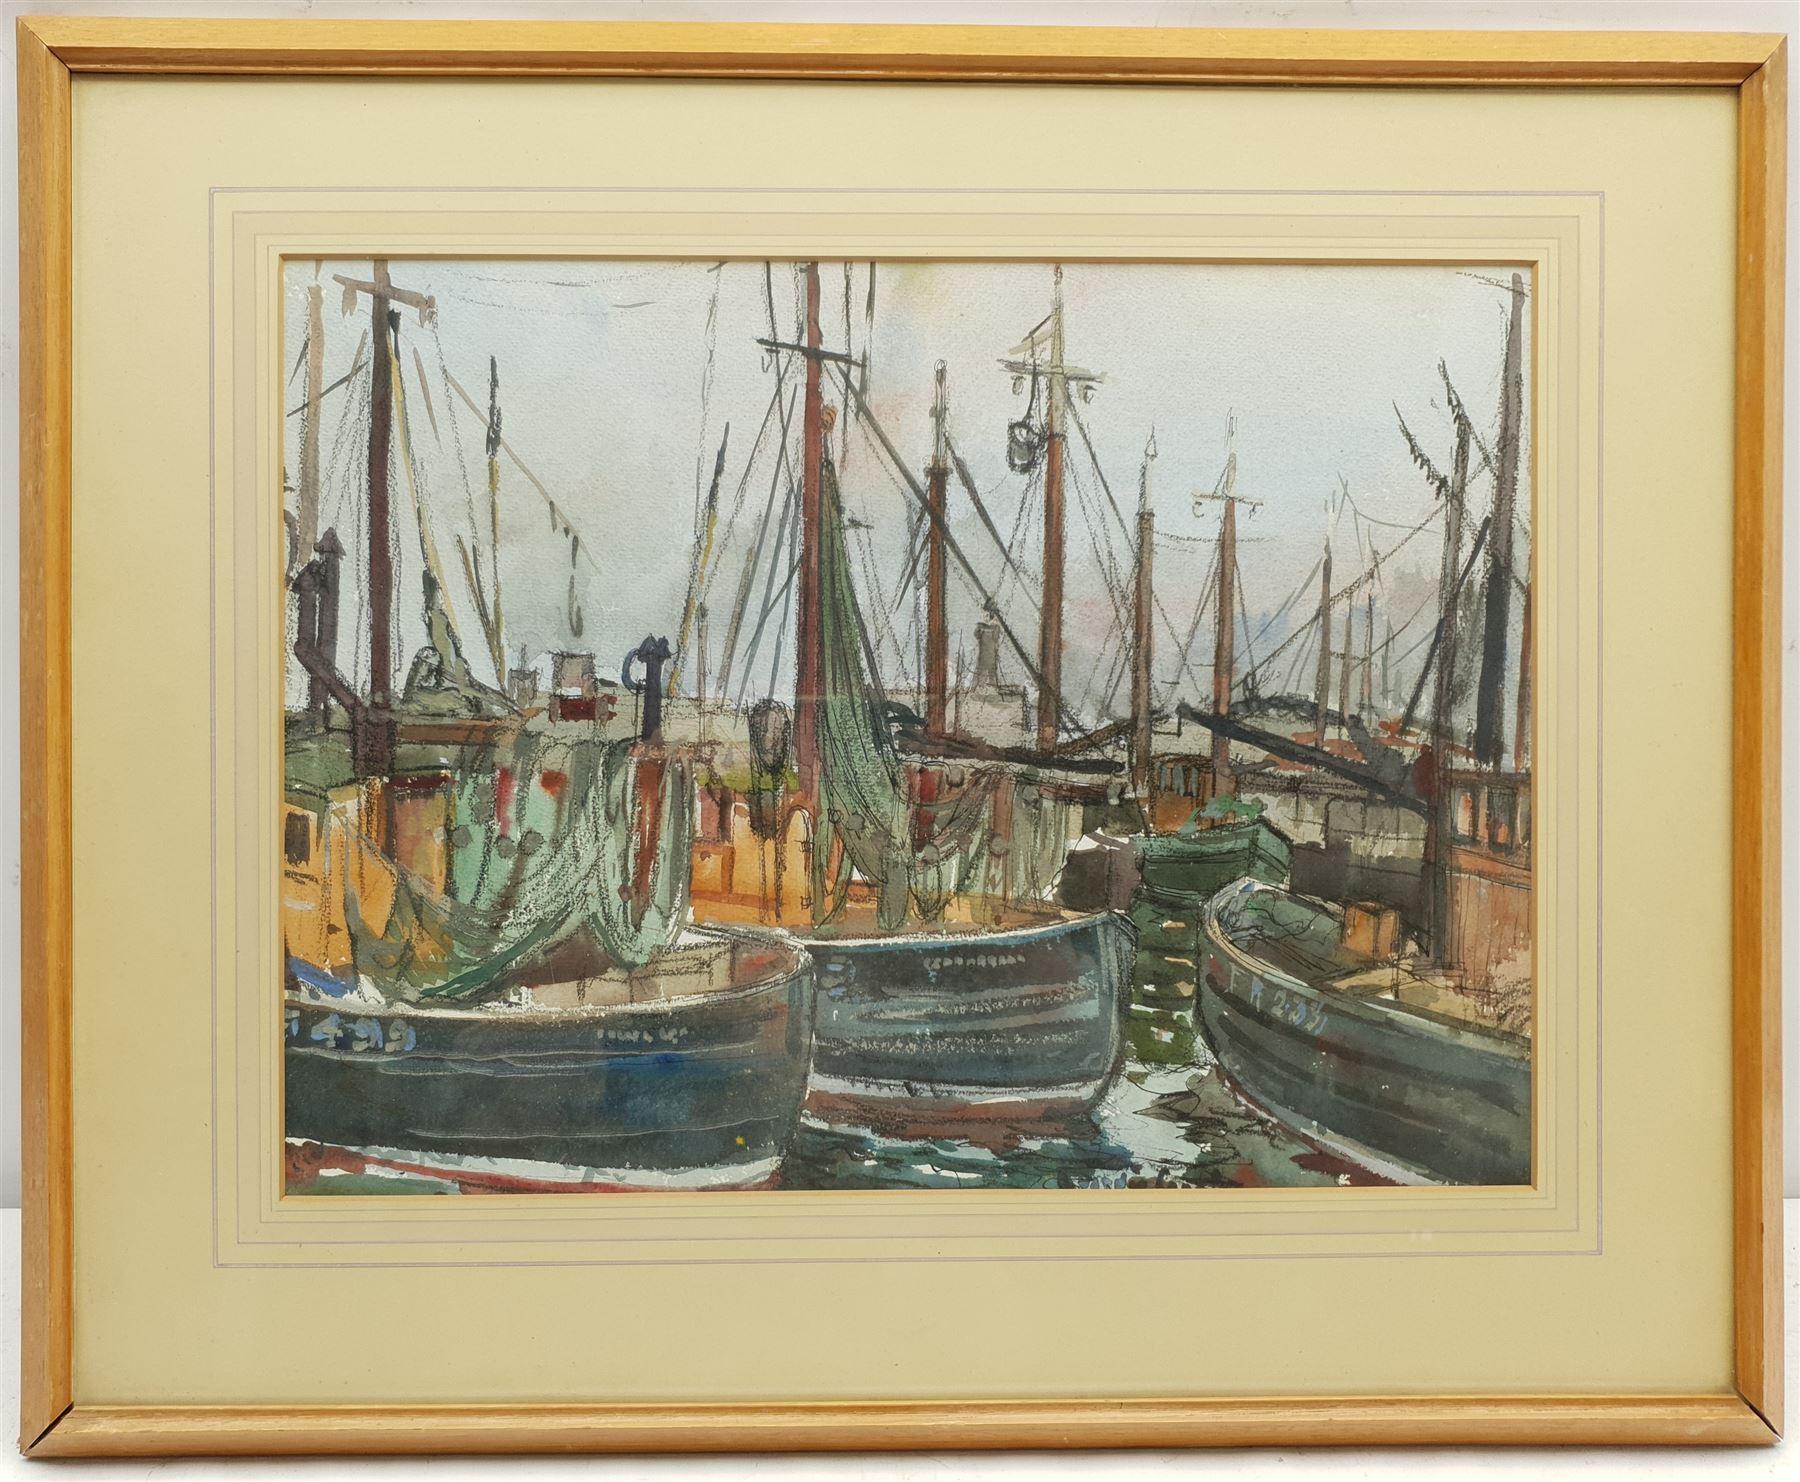 Robert Hardie Condie (Scottish 1898-1981): 'Masts and Nets Fraserburgh' - Image 2 of 4